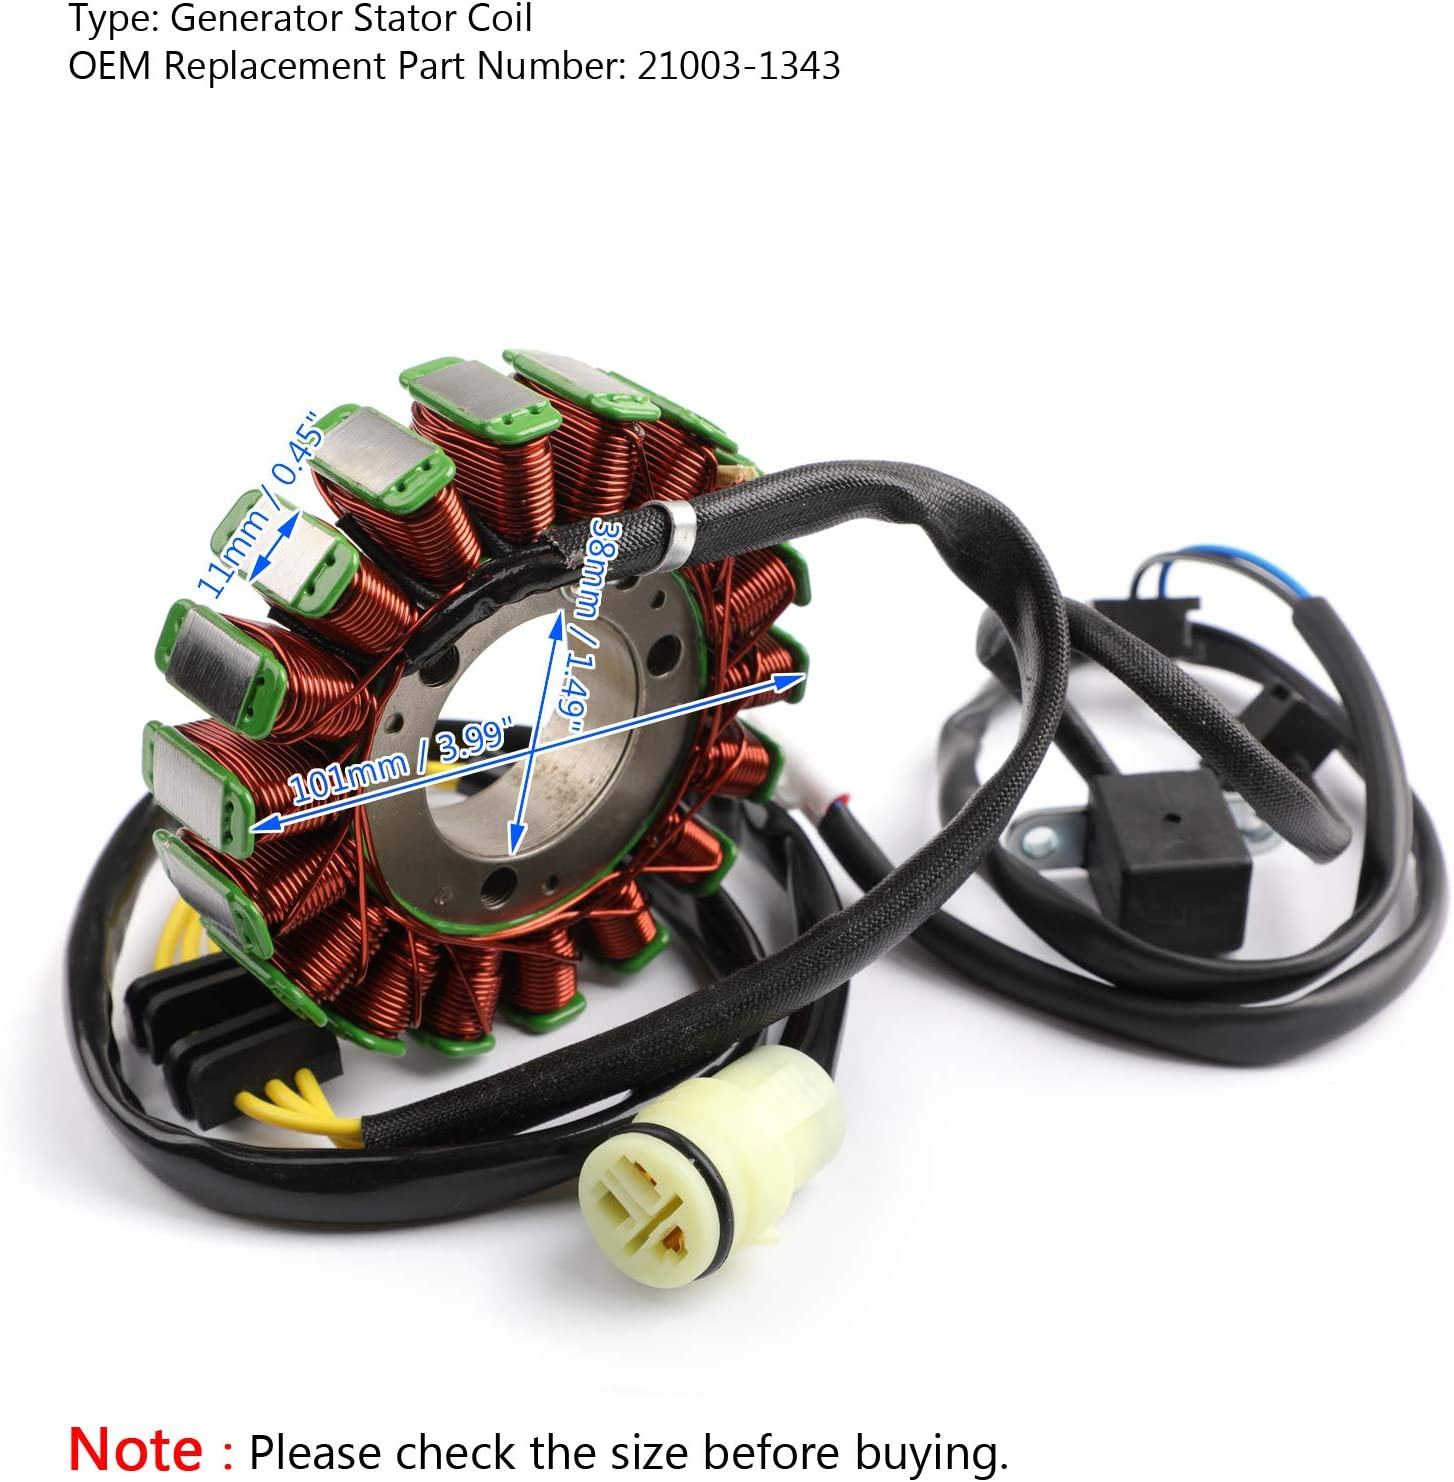 Areyourshop Magneto Generator Stator Coil for KVF300 Prairie 1999-2002 21003-1343